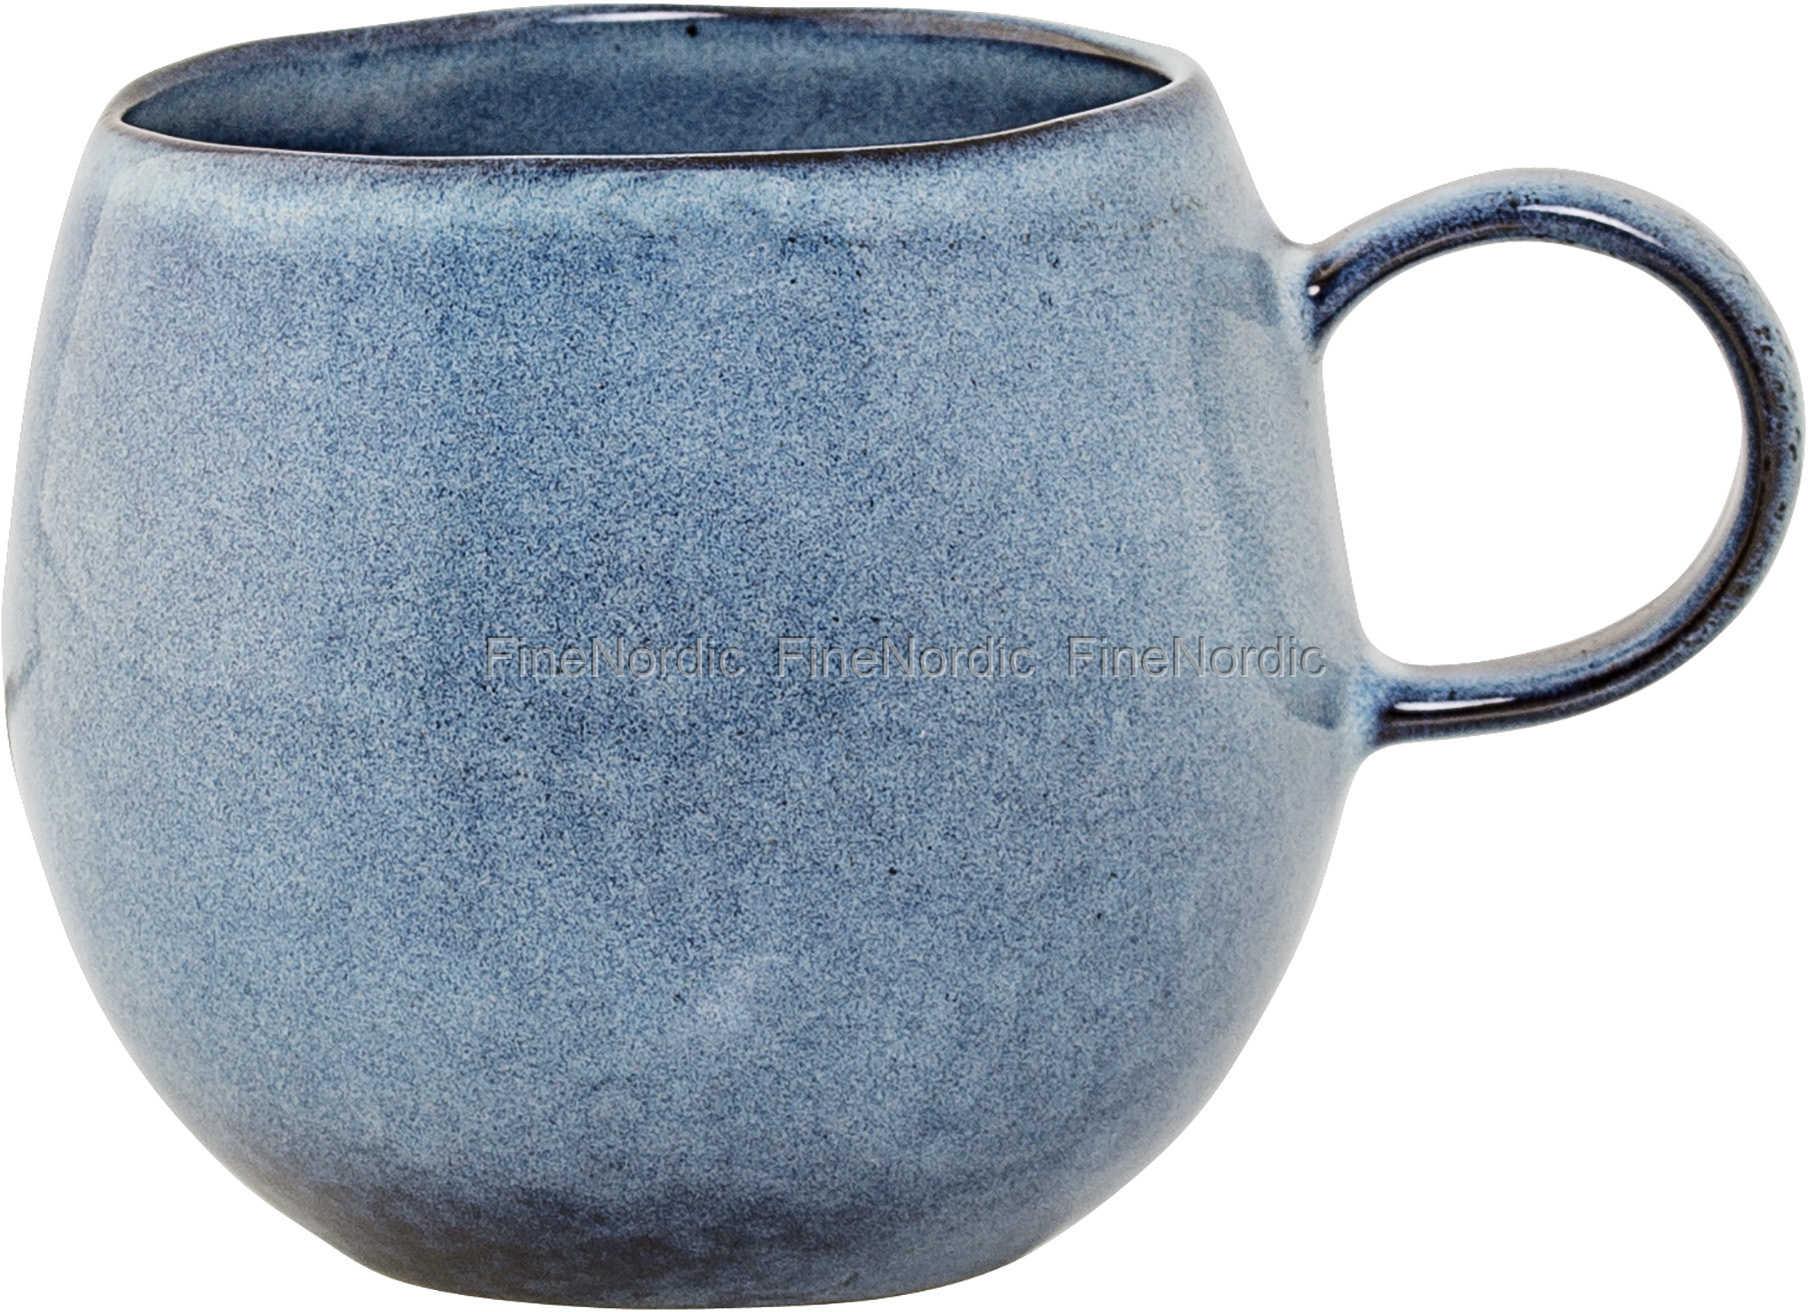 krus keramik Bloomingville Sandrine Keramik Krus Blå krus keramik